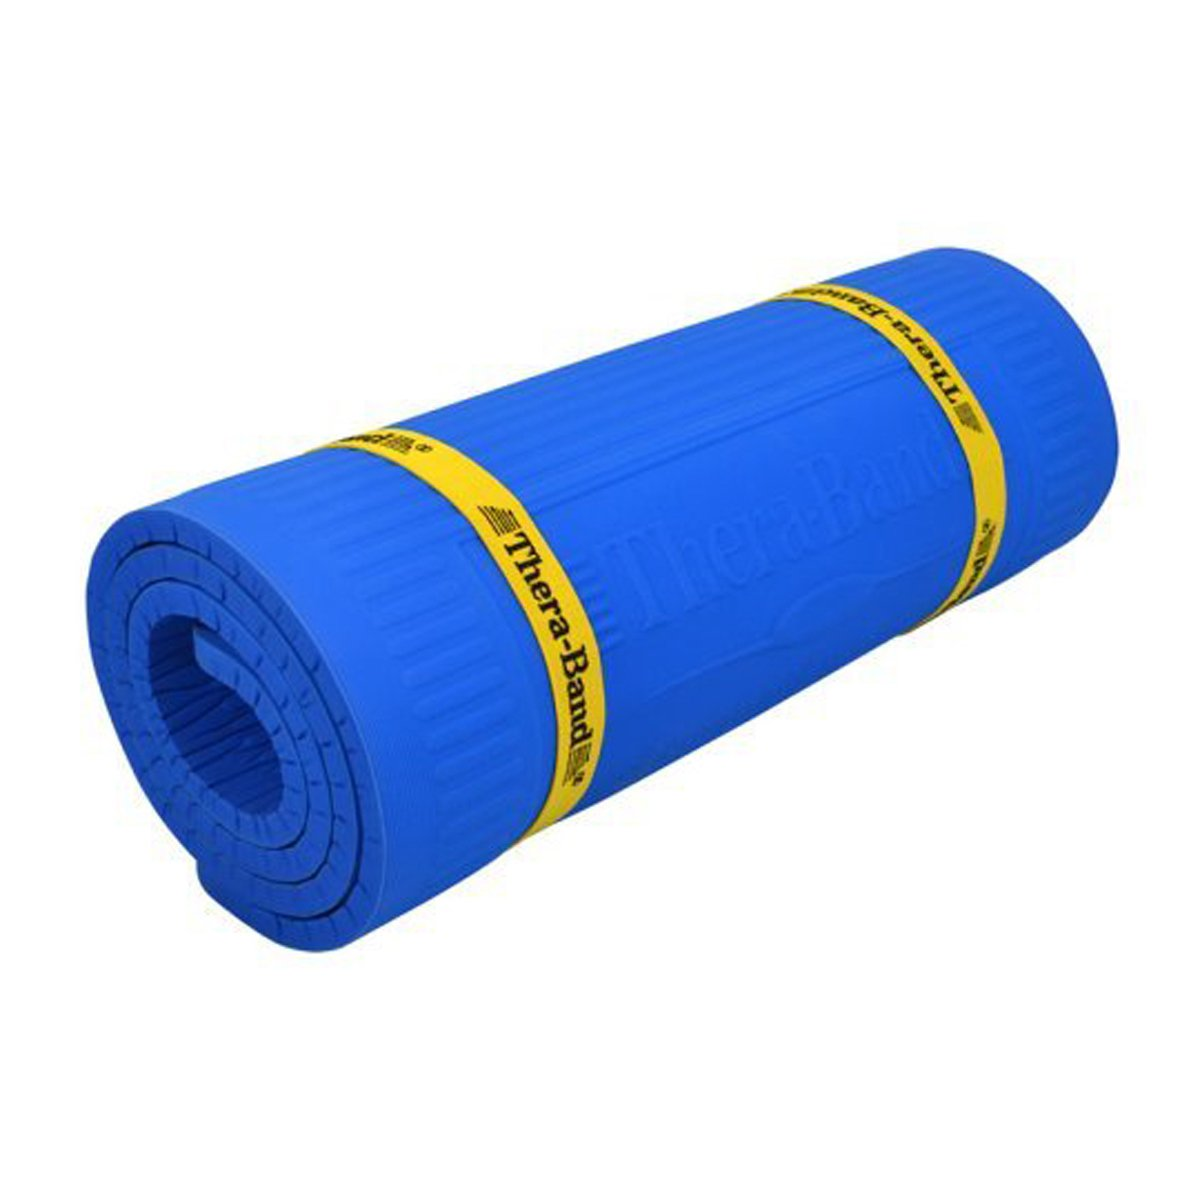 TheraBand Exercise Professional Waterproof Washable